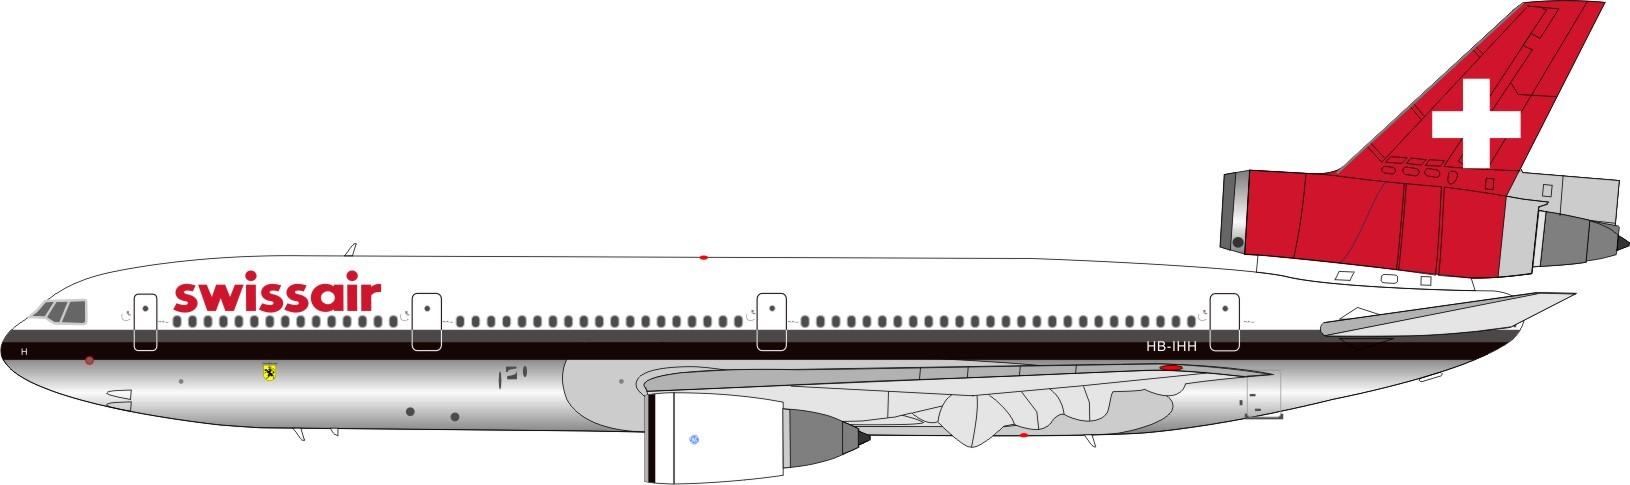 Inflight 200 BDC103001P 1//200 Swissair DC-10-30 HB-IHE poli avec support